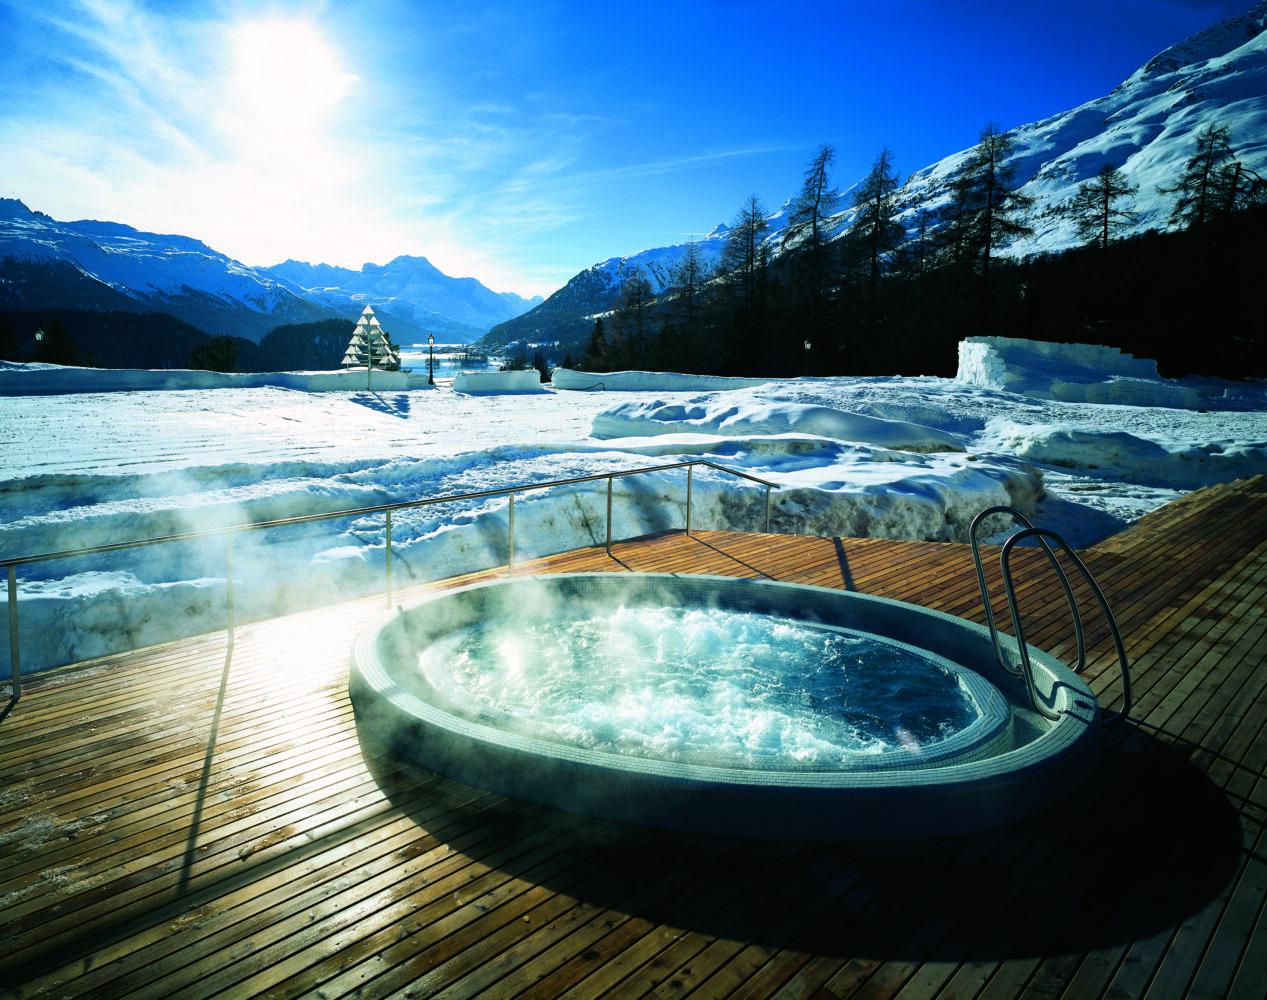 heated outdoor whirlpool-suvretta house switzerland